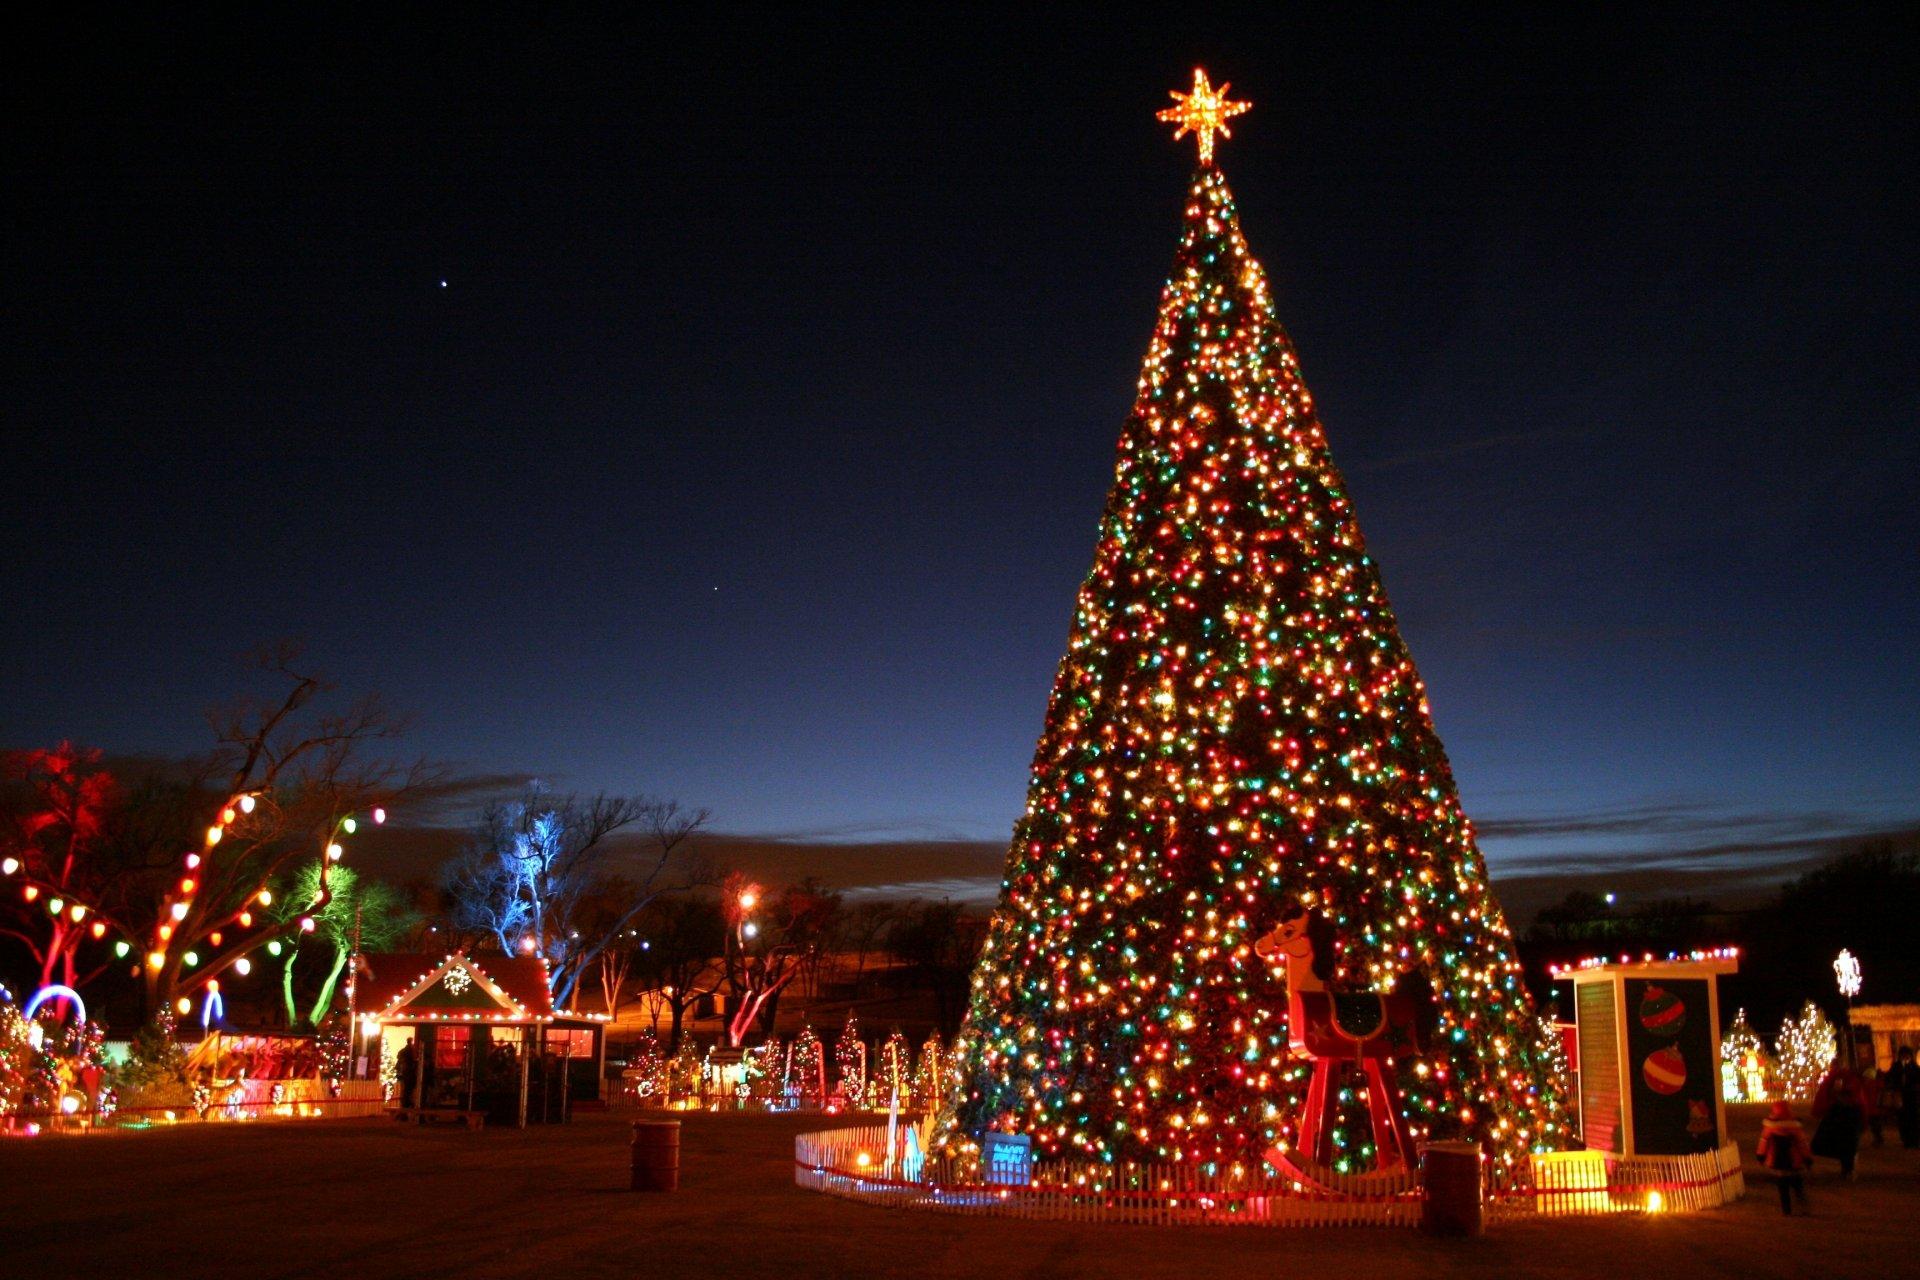 Новый год картинки елка, координатам